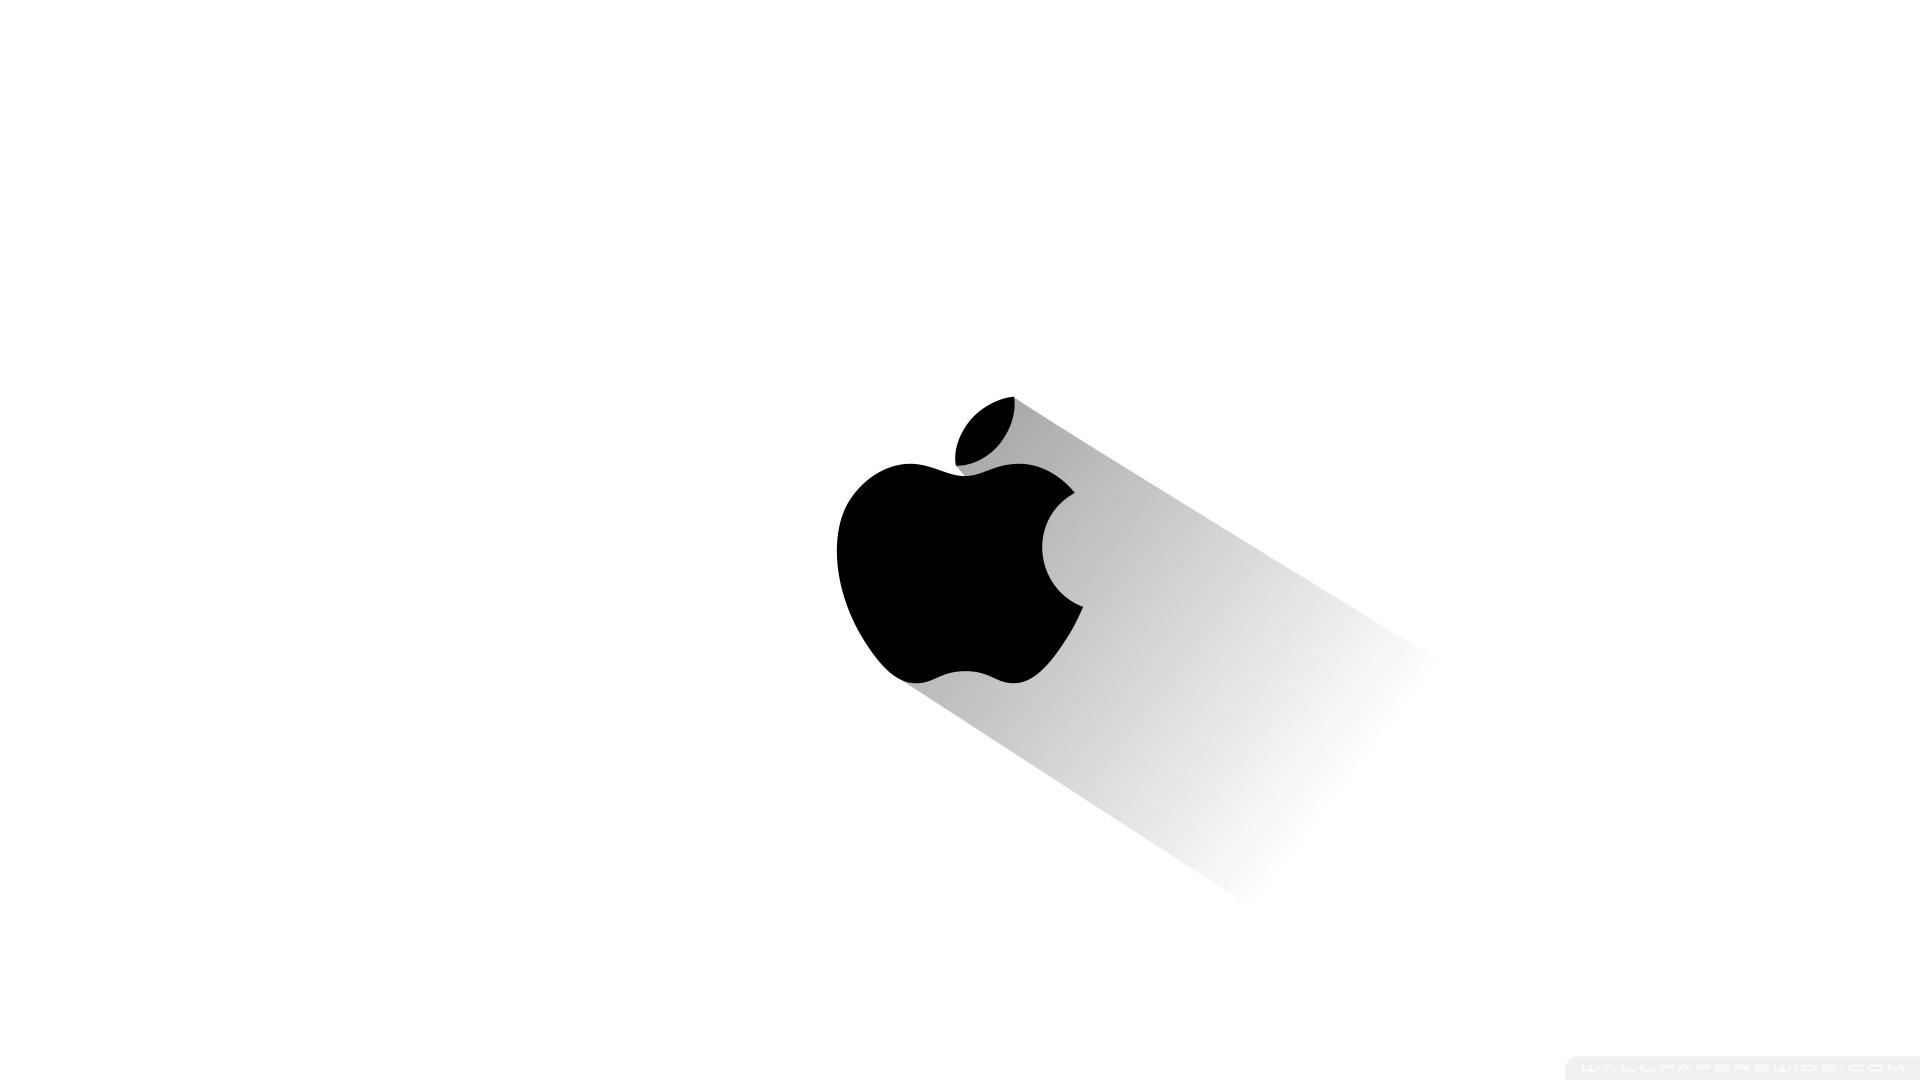 10 latest apple logo wallpaper hd 1080p full hd 1080p for pc desktop